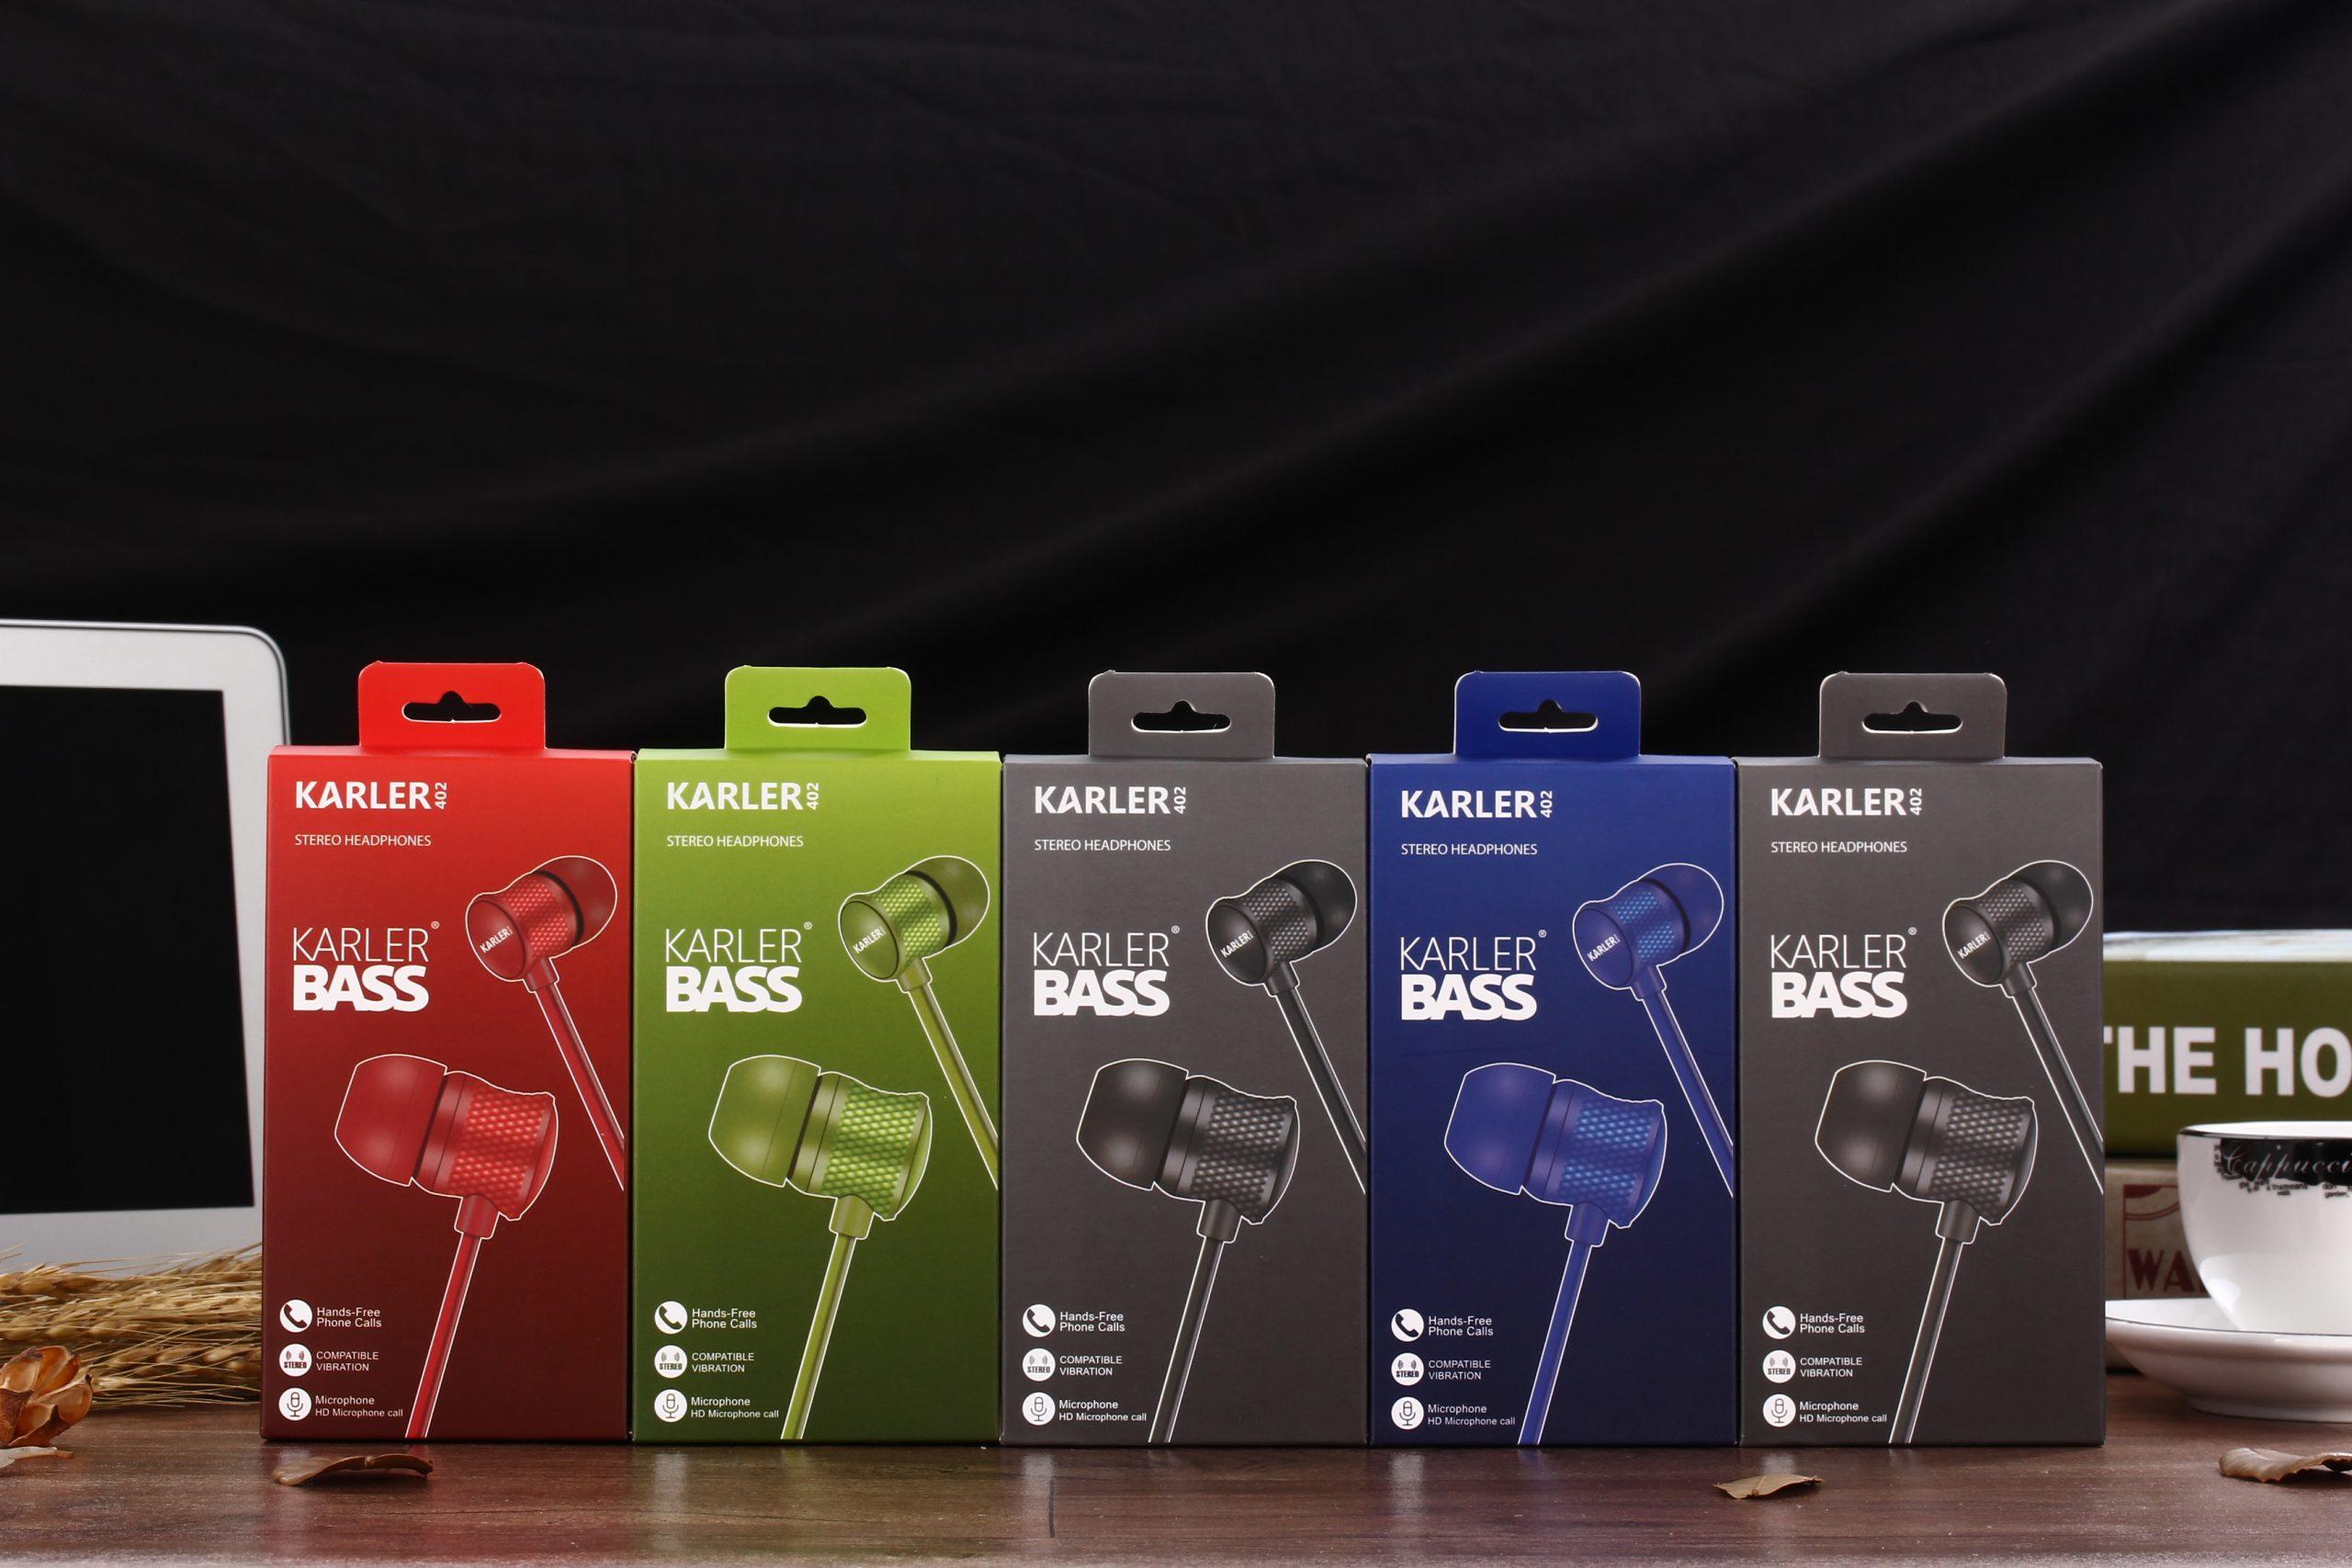 karler bass 402 ενσύρματα ακουστικά διαφημιστικό